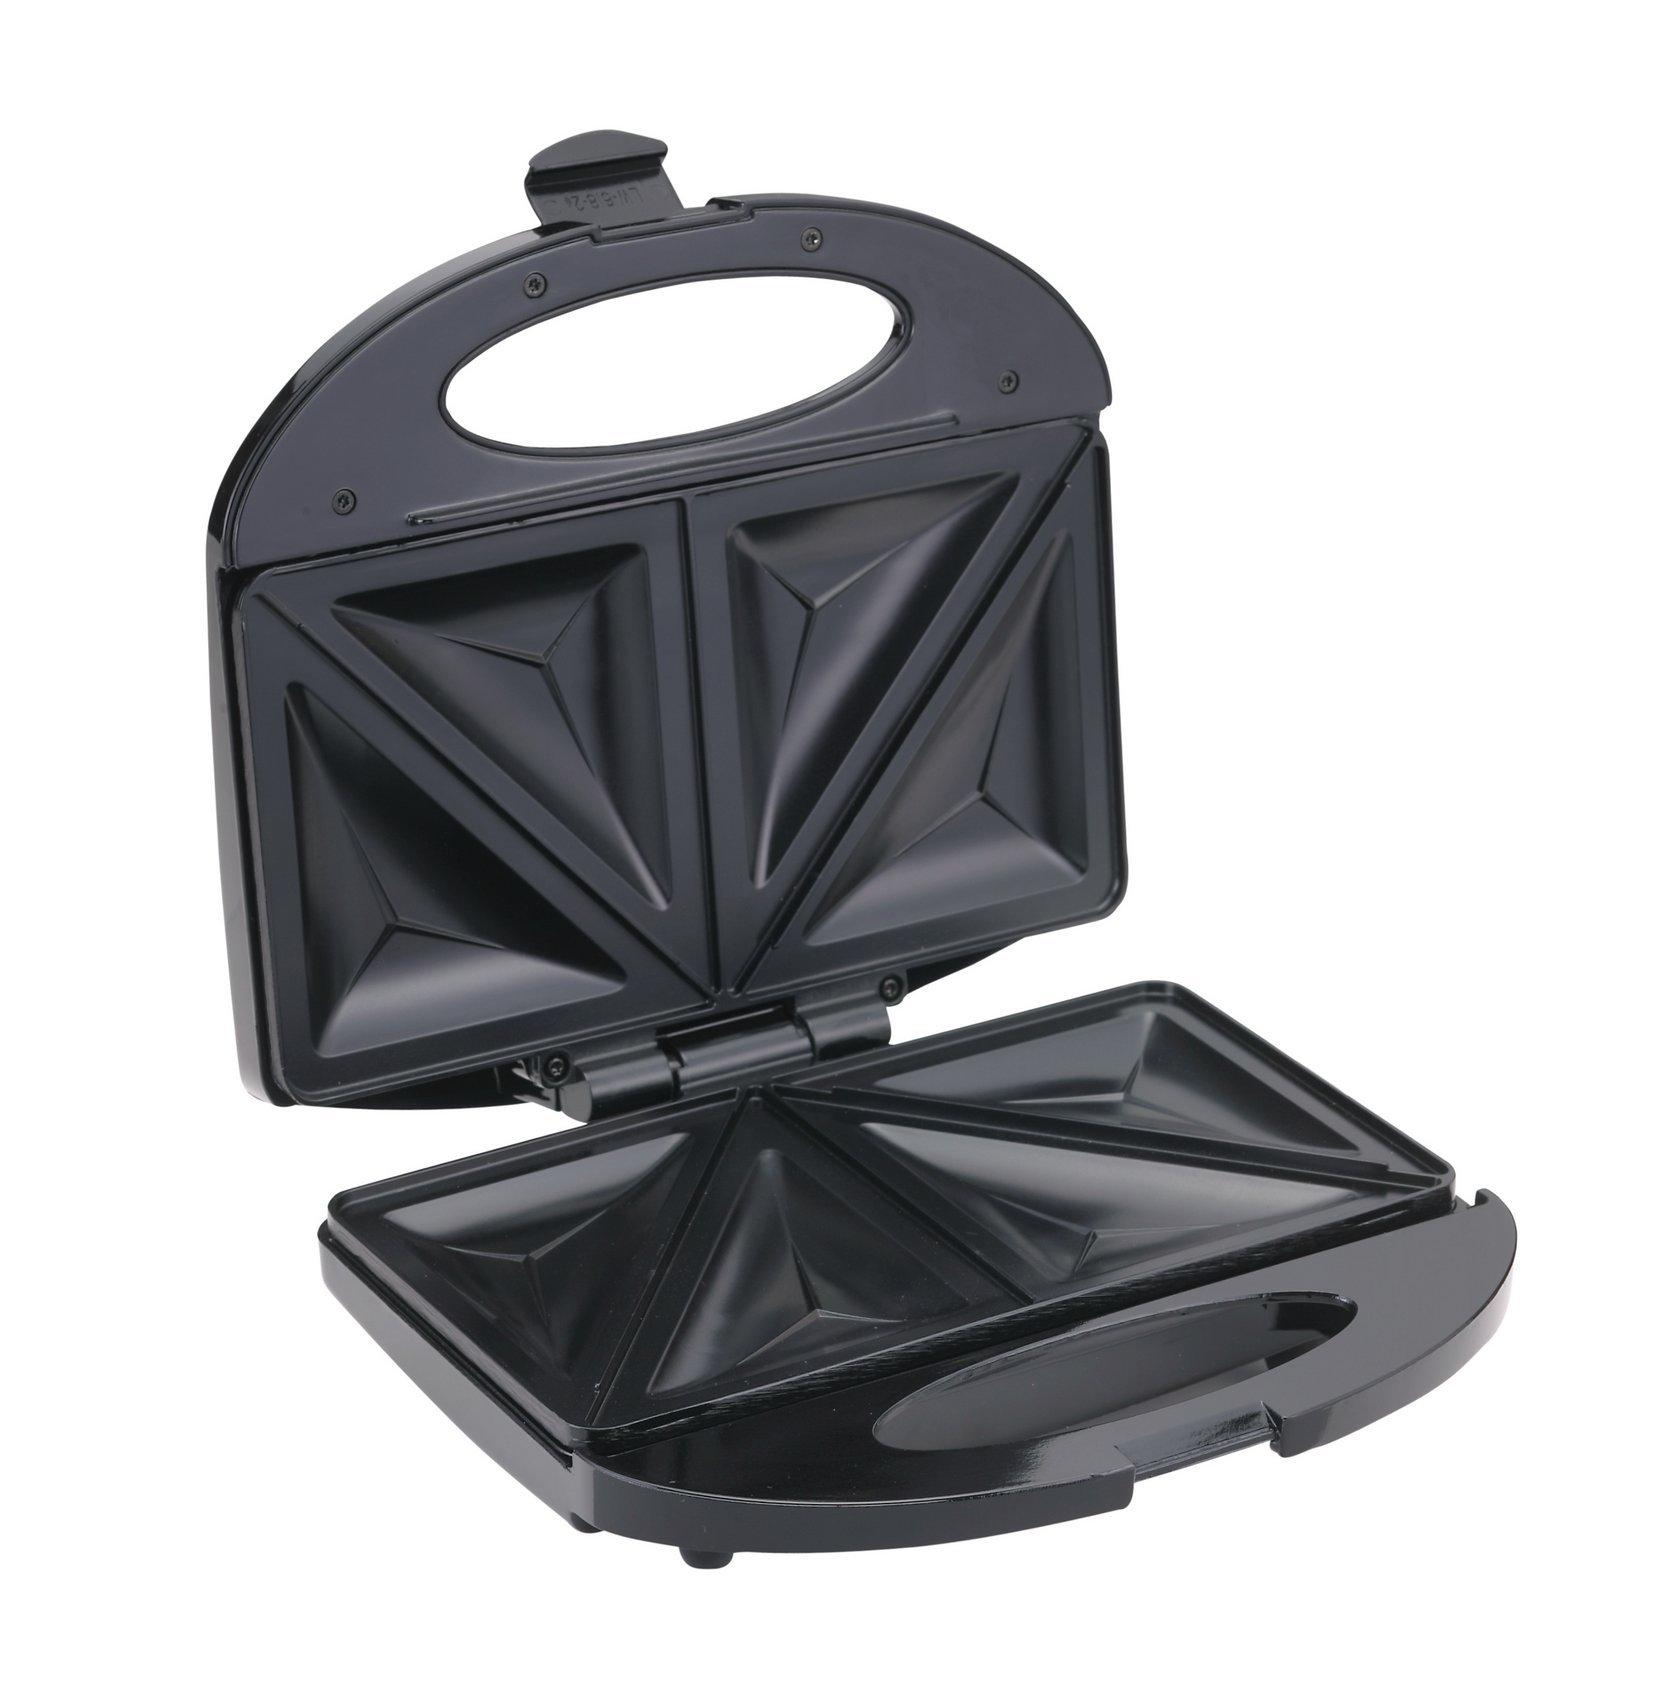 BLACK & DECKER TS 1000 220V Sandwich Maker 600W 220-240V (Not for USA), Black by BLACK+DECKER (Image #5)